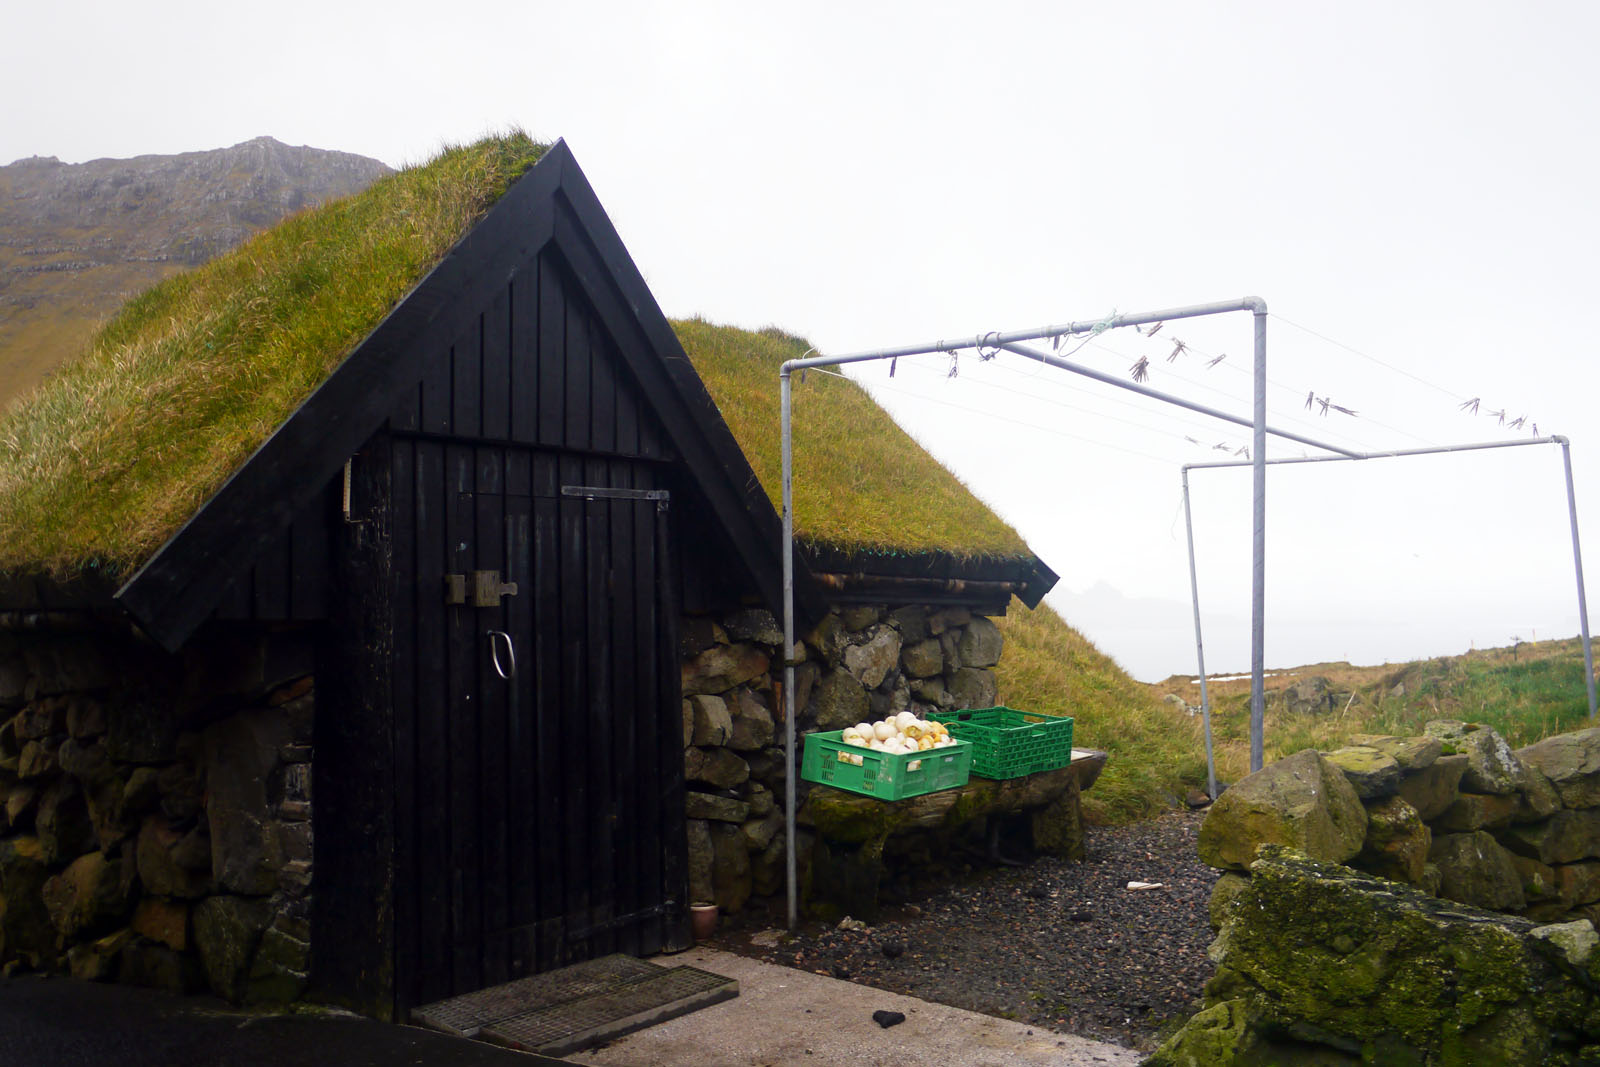 Faroer Inseln-Haus-Grasdach